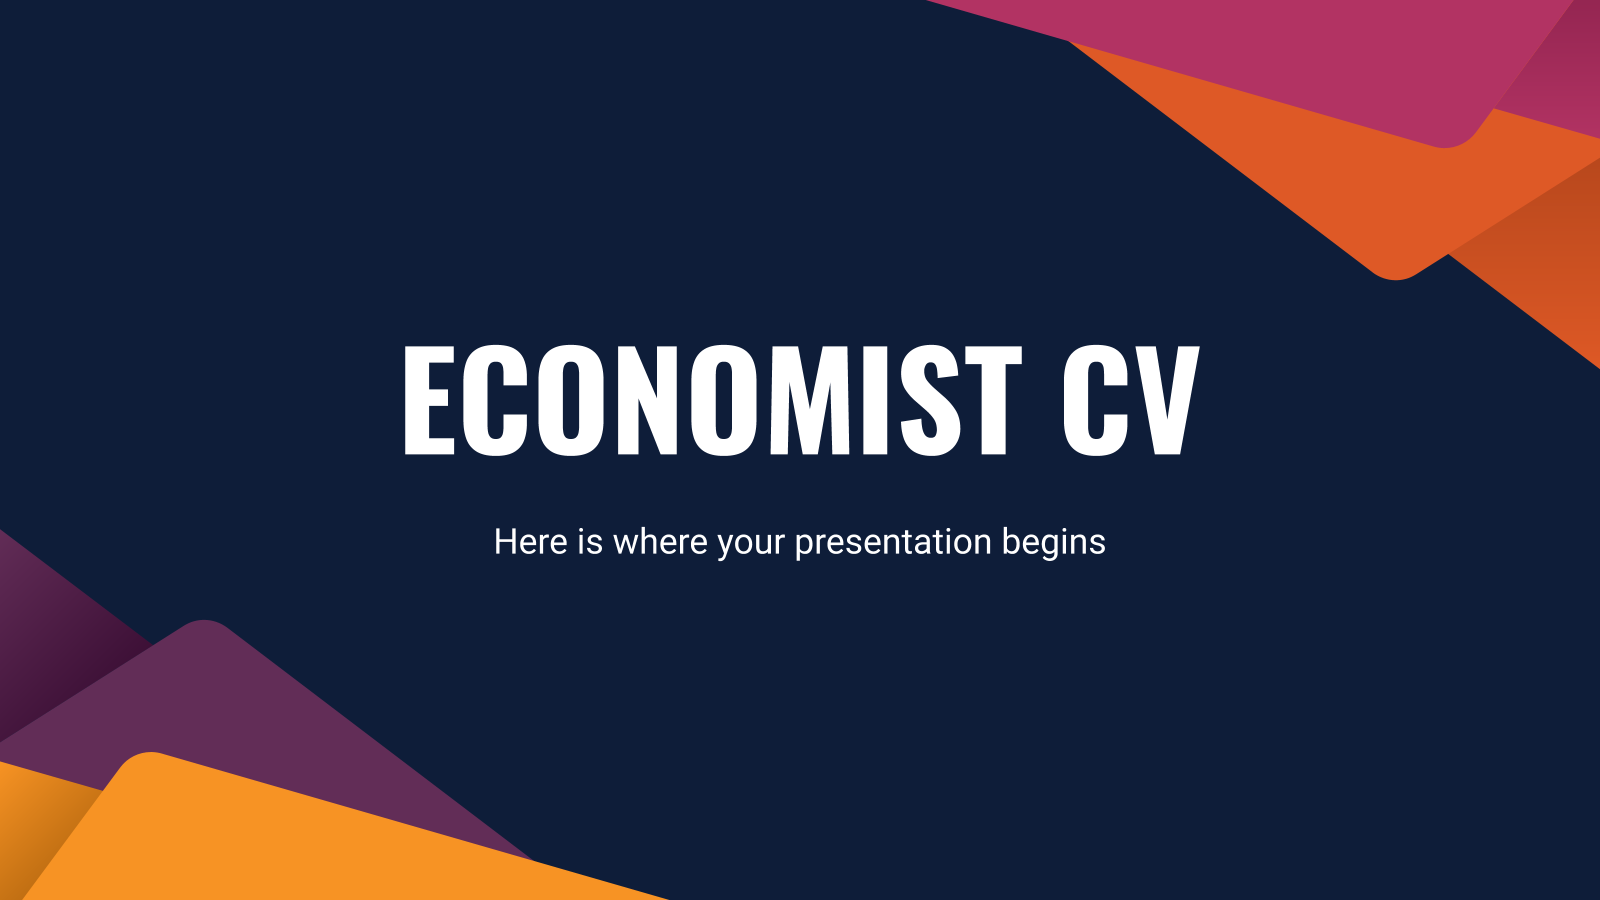 Economist CV presentation template